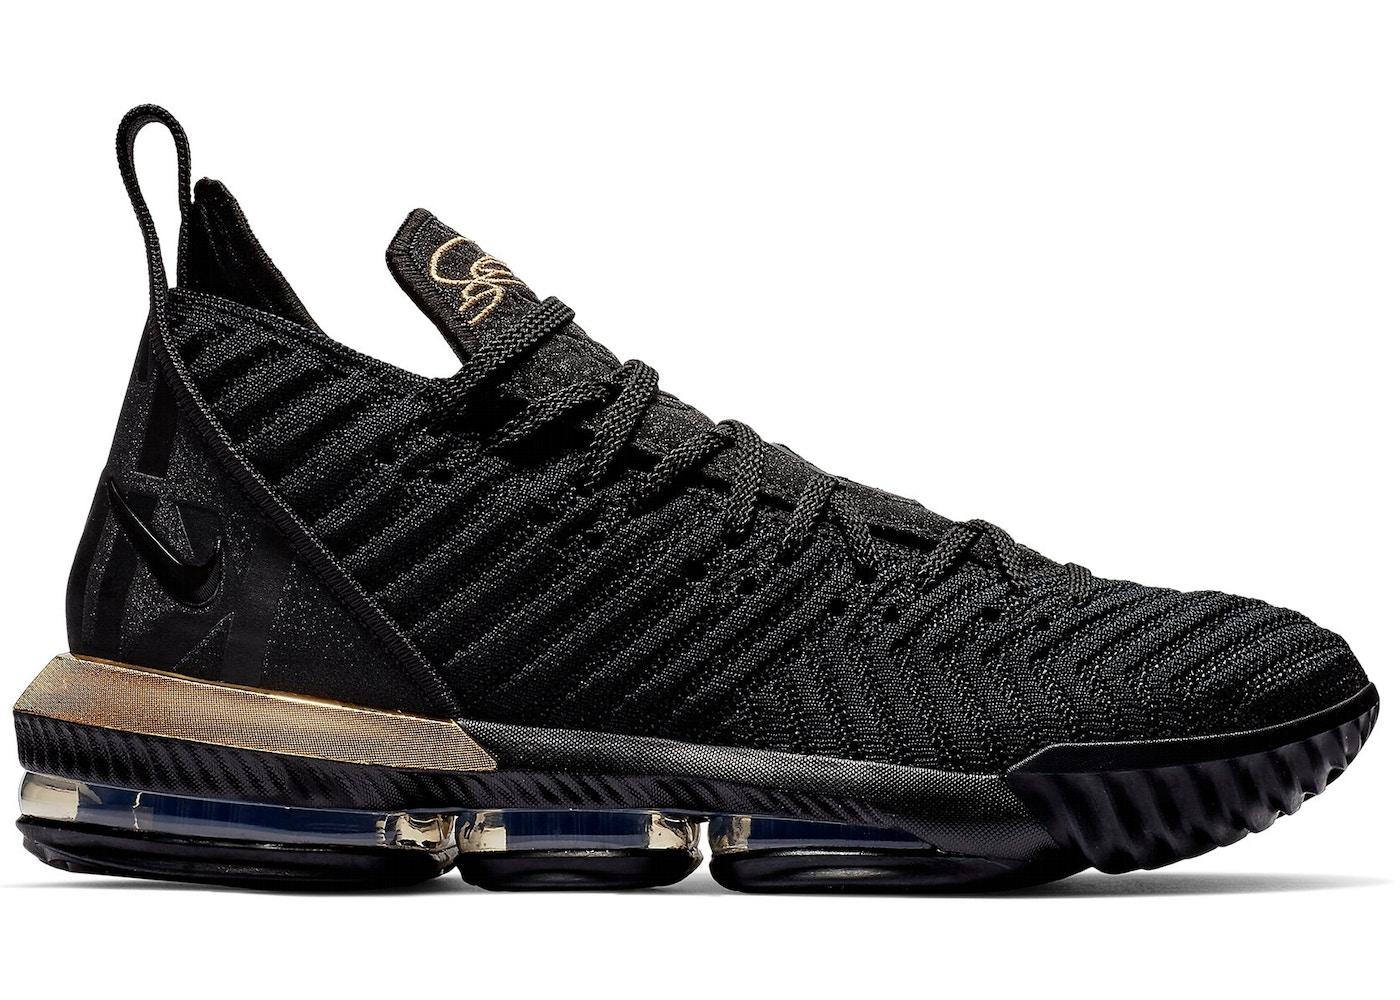 pretty nice c416e 64b71 Buy Nike LeBron Shoes  Deadstock Sneakers